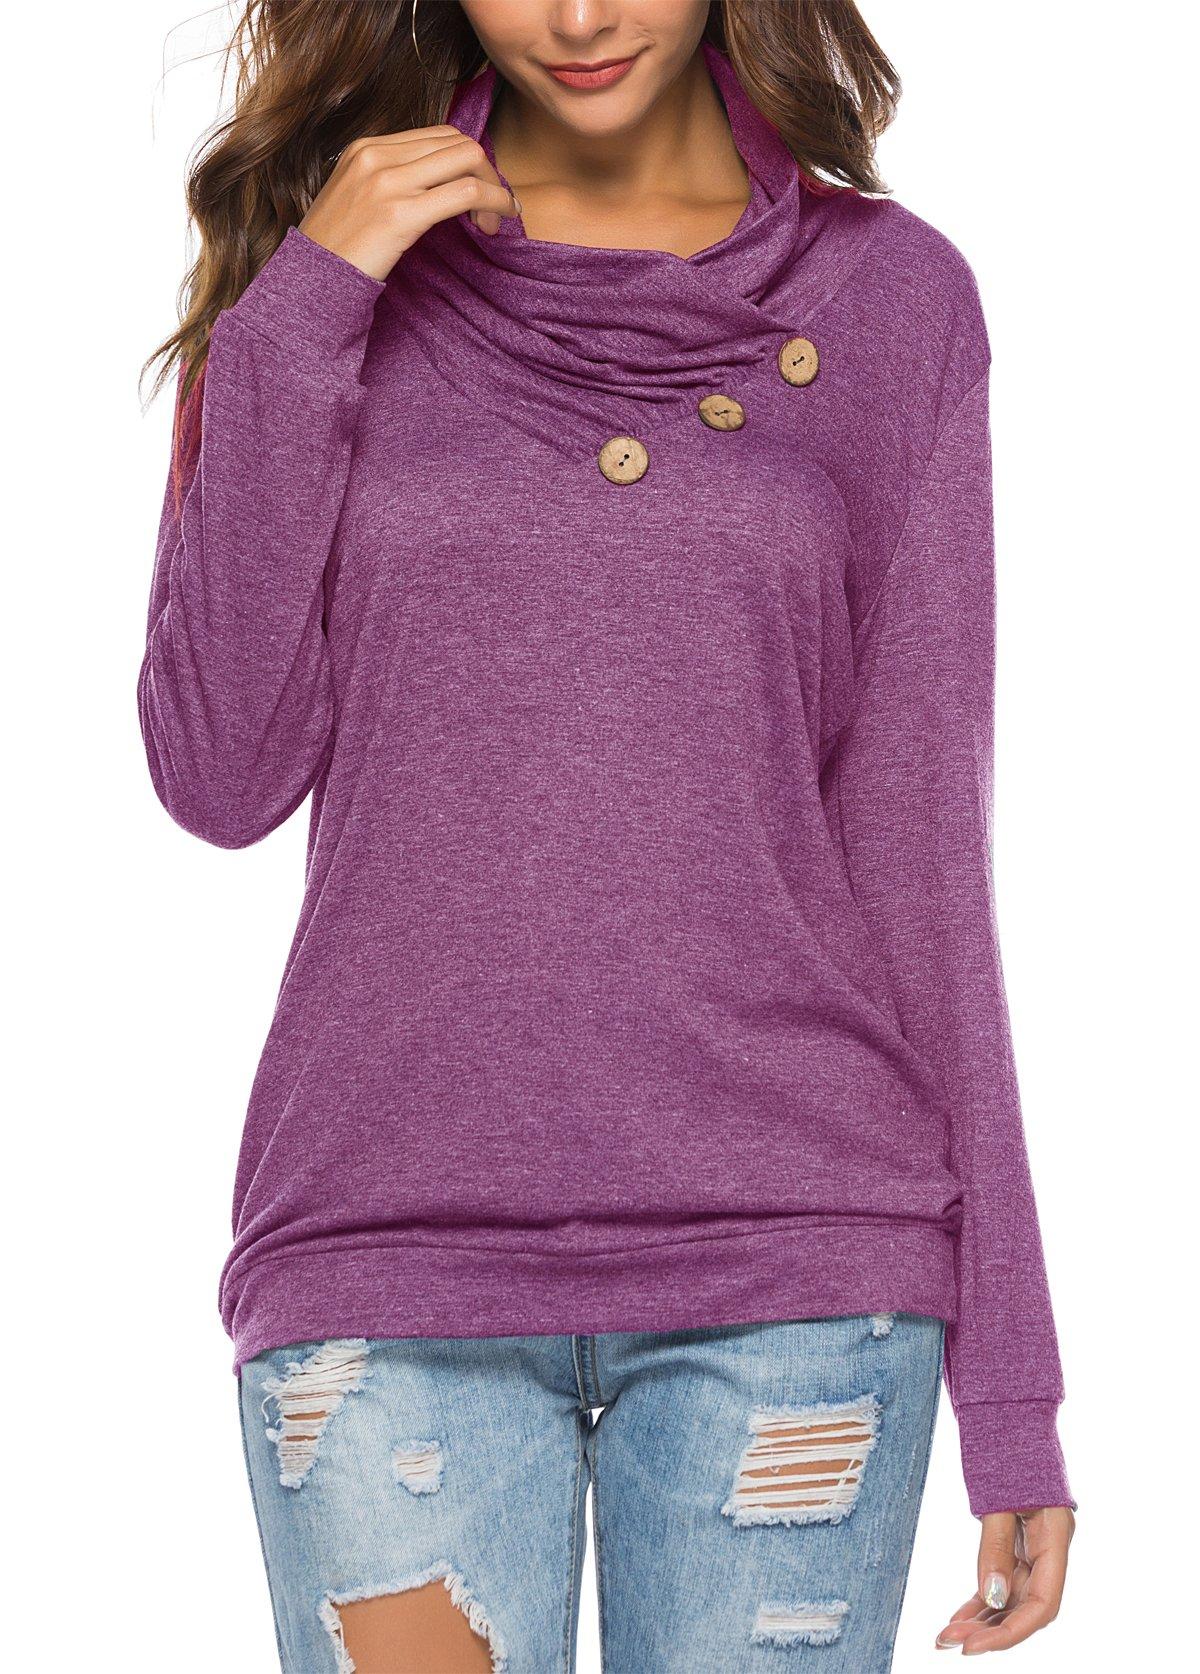 KISSMODA Womens Shirts Fashion Slimming Tunic Tops with Button Cowl V Neck WineRed Medium